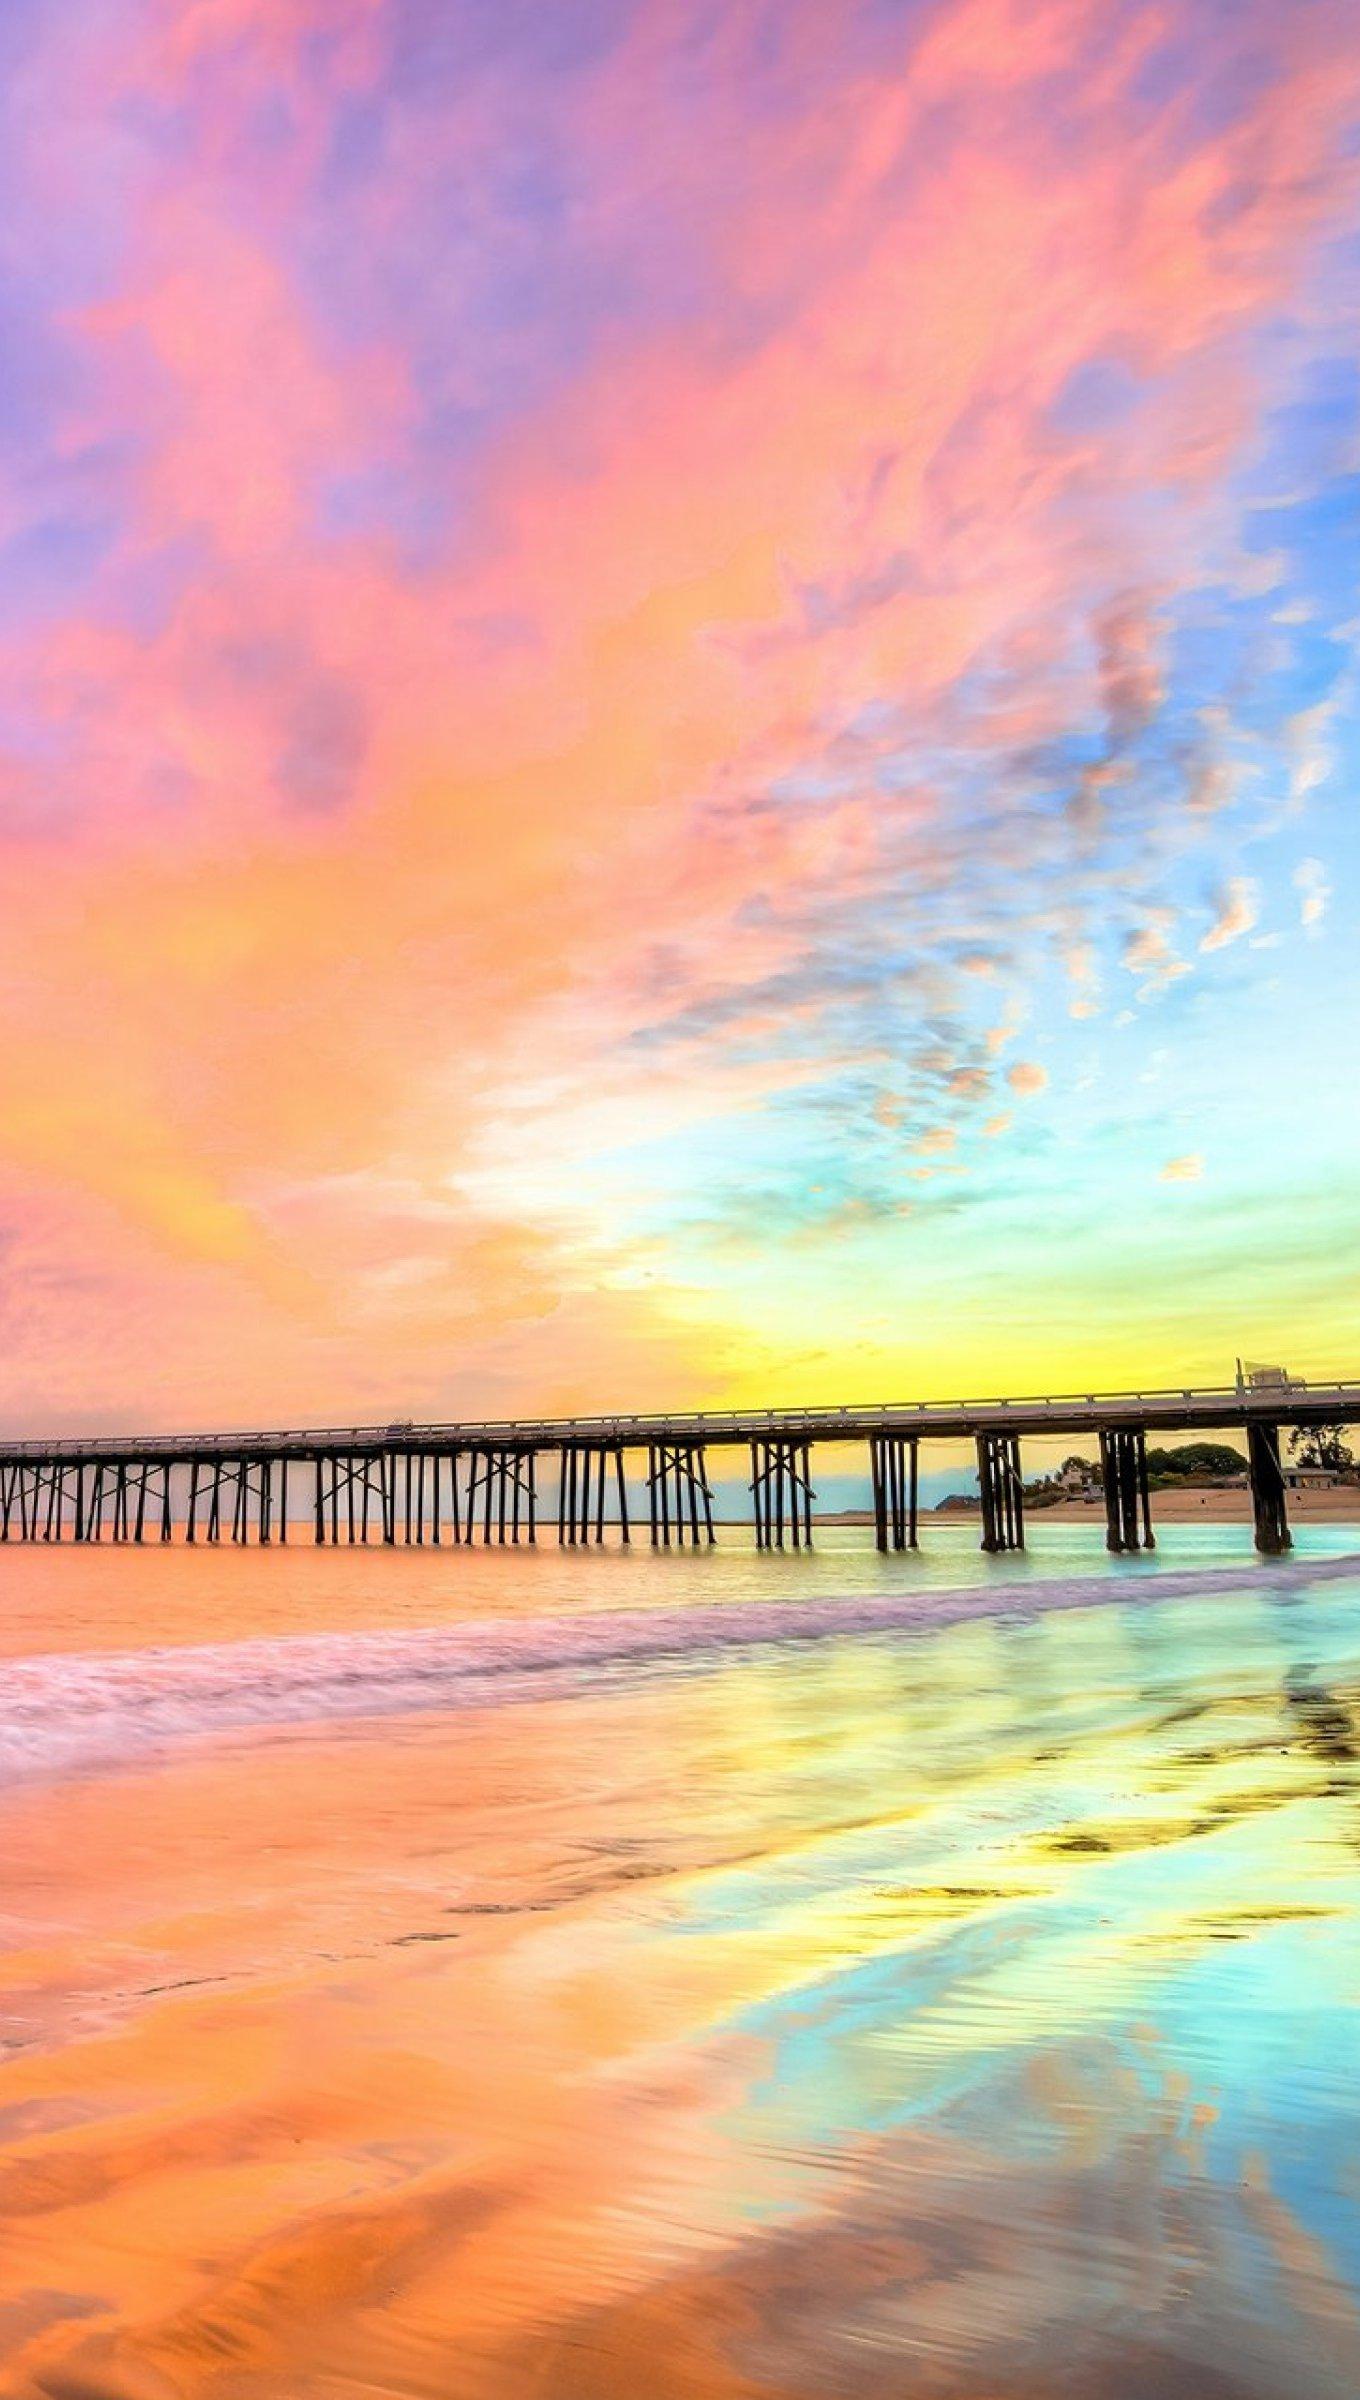 Wallpaper Sunset at pier in California's Beach Vertical